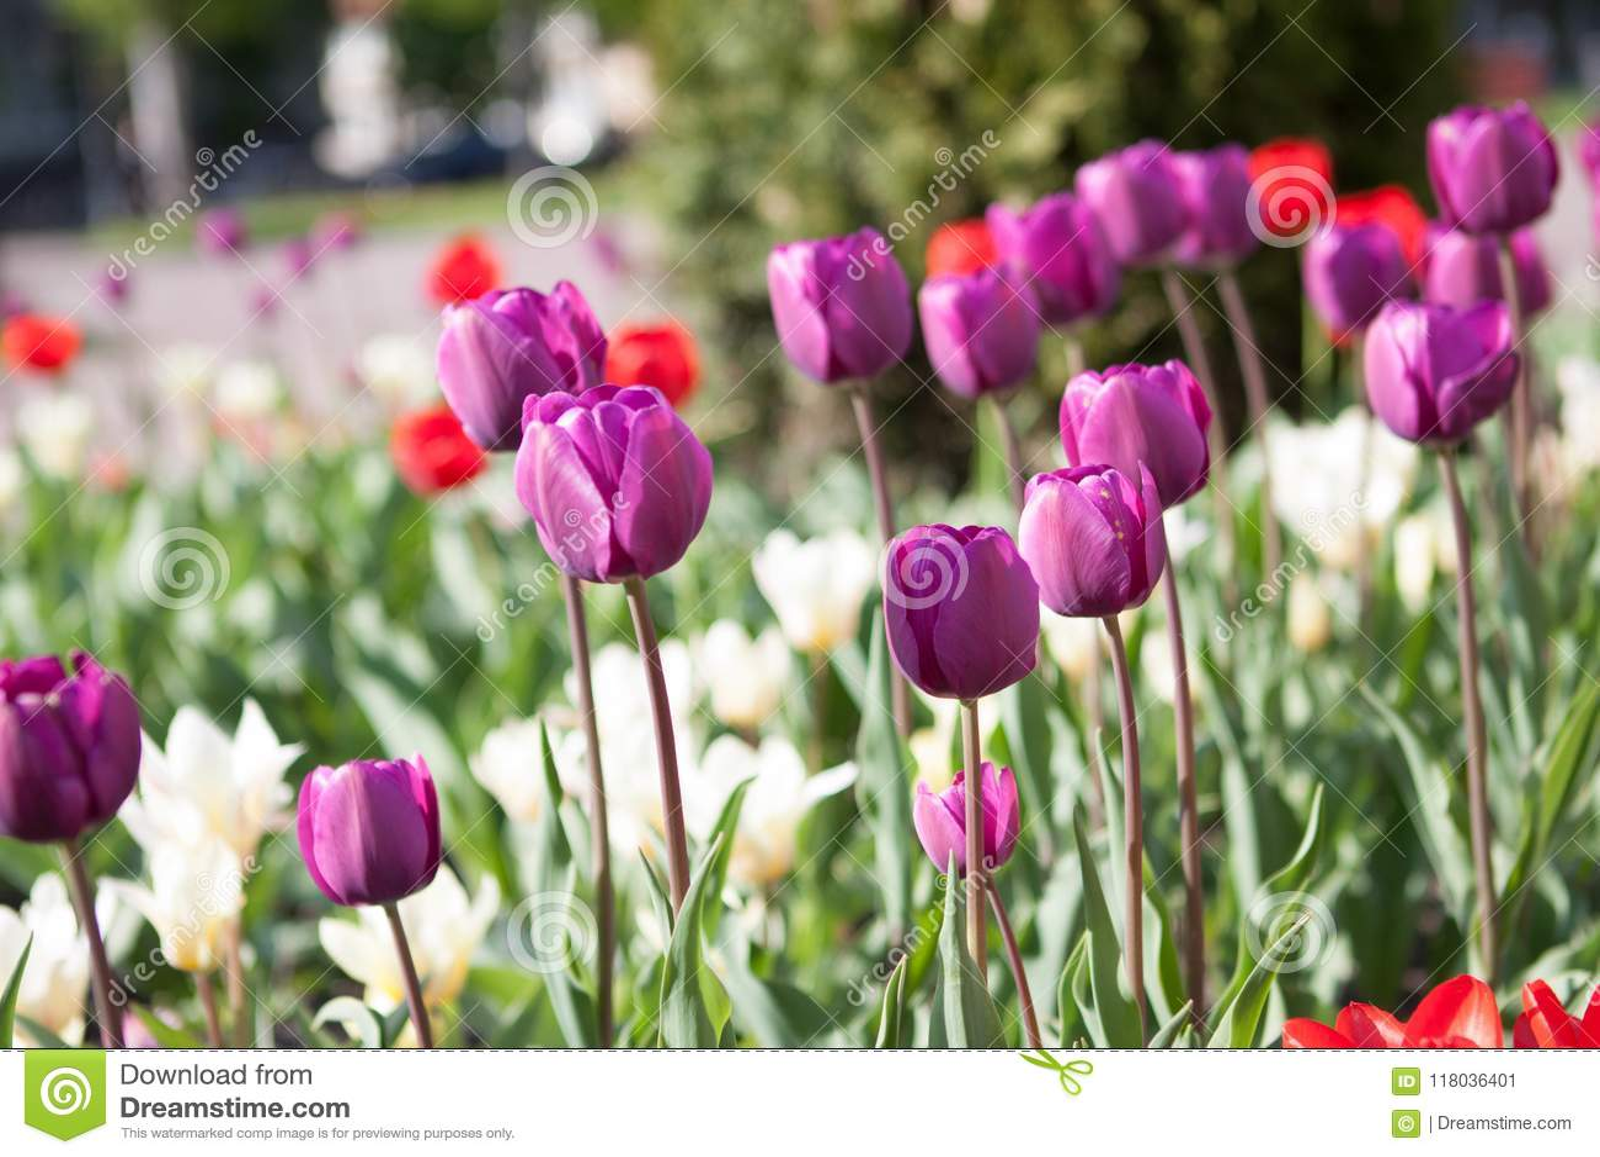 Beautiful Colorful Purple Tulips Flowers Bloom In Spring Garden